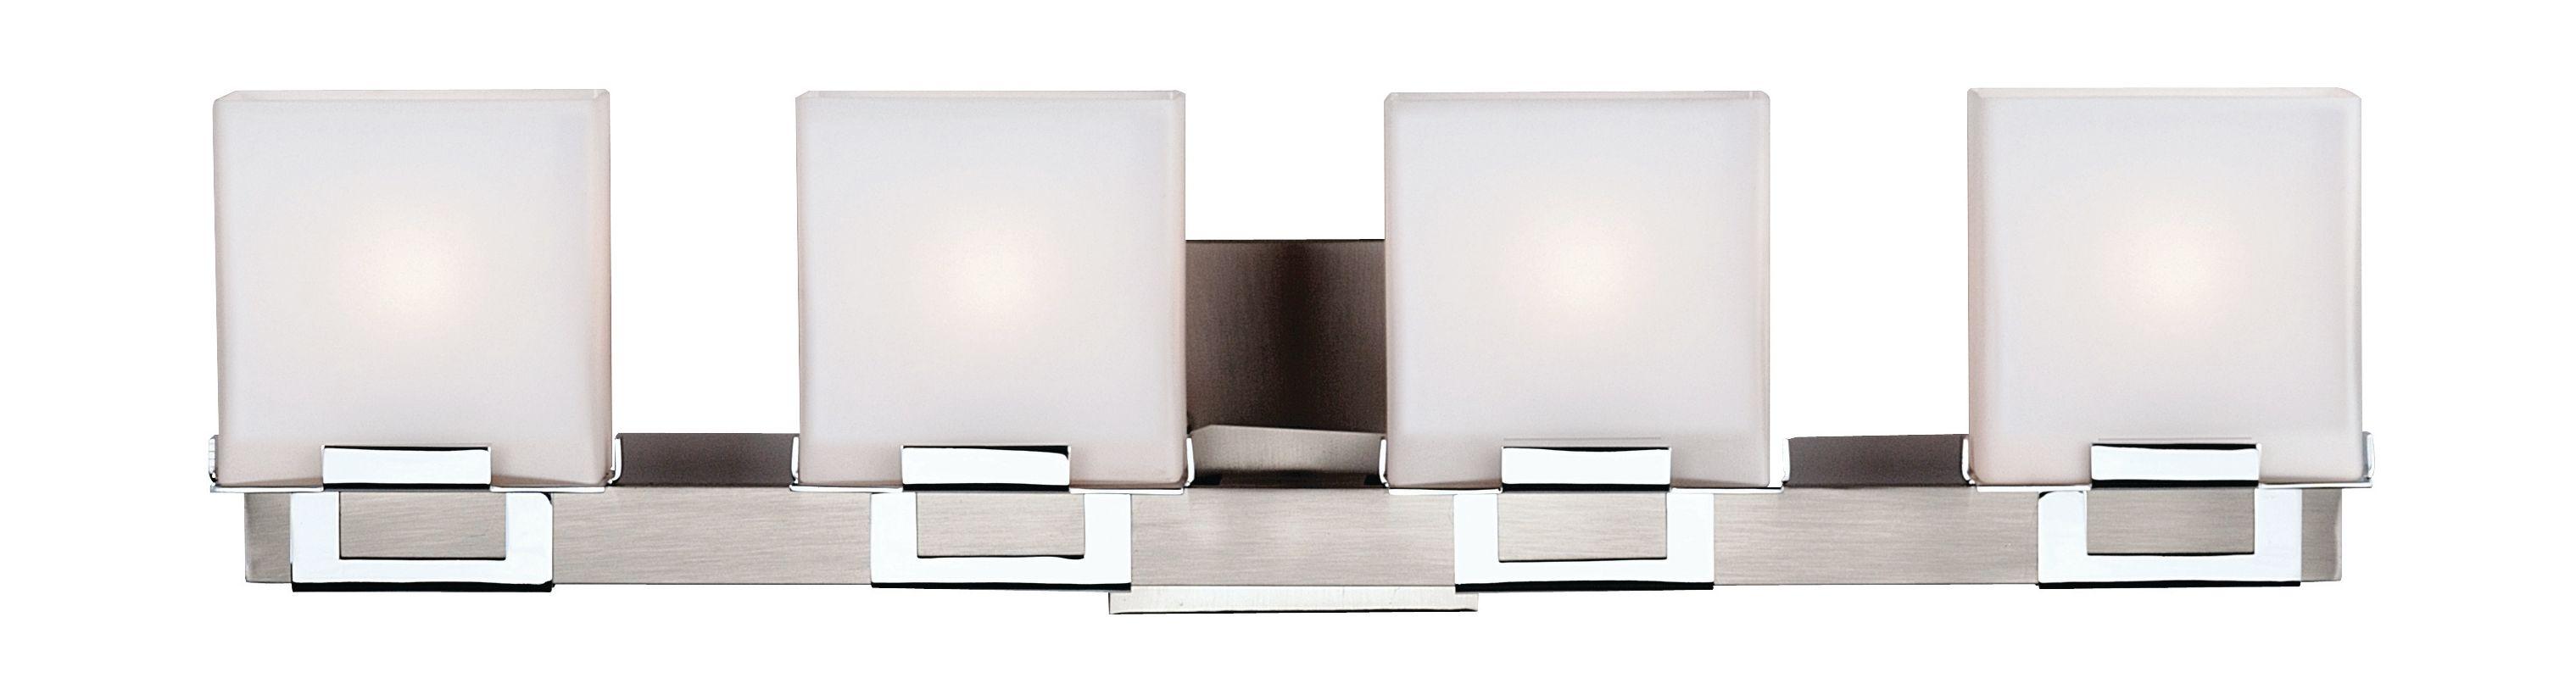 Philips F442236NV Square 4 Light Bathroom Vanity Light Satin Nickel